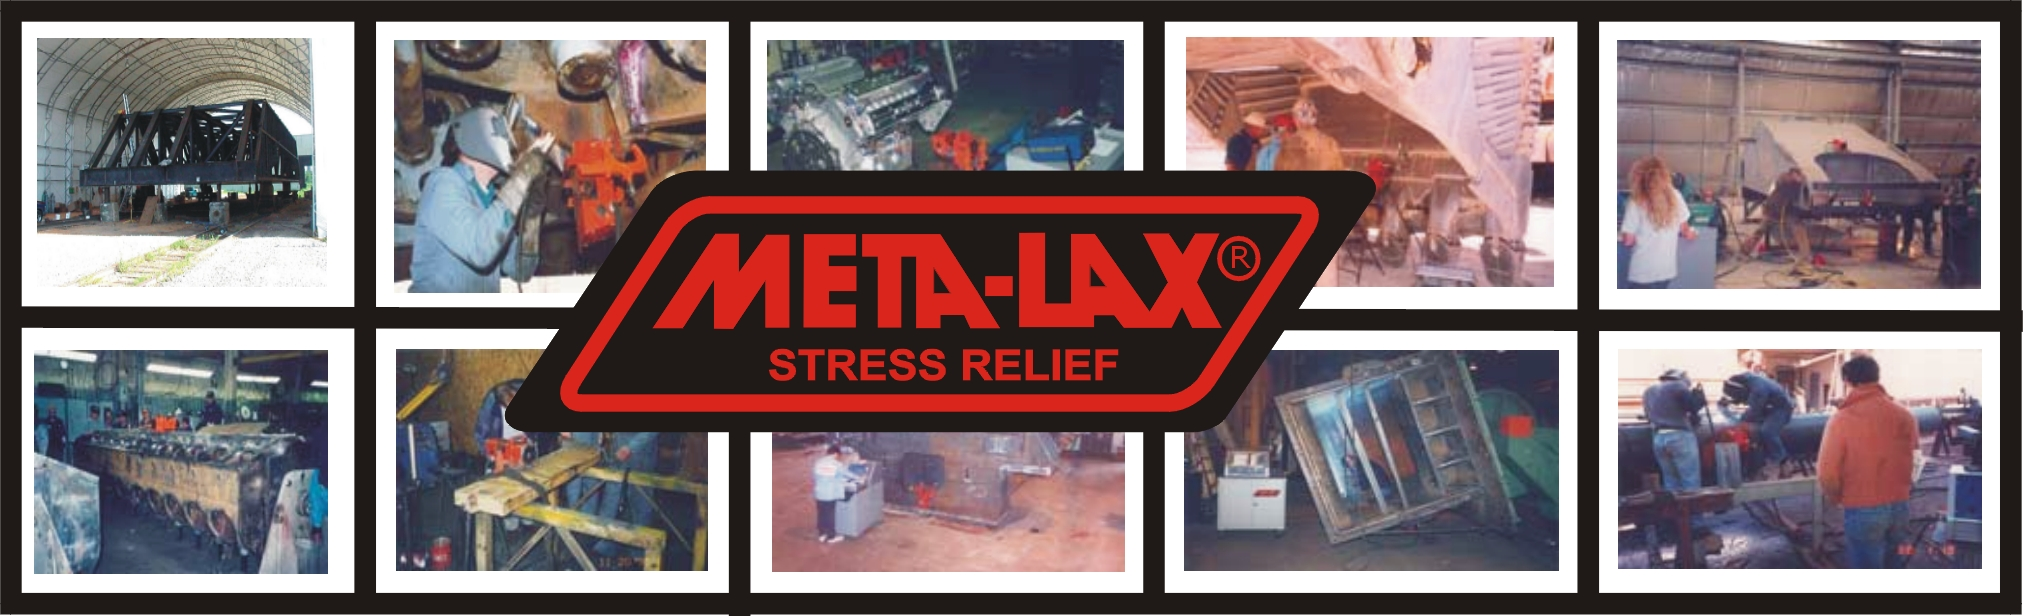 Meta Lax Sub Harmonic Vibration Stress Relief